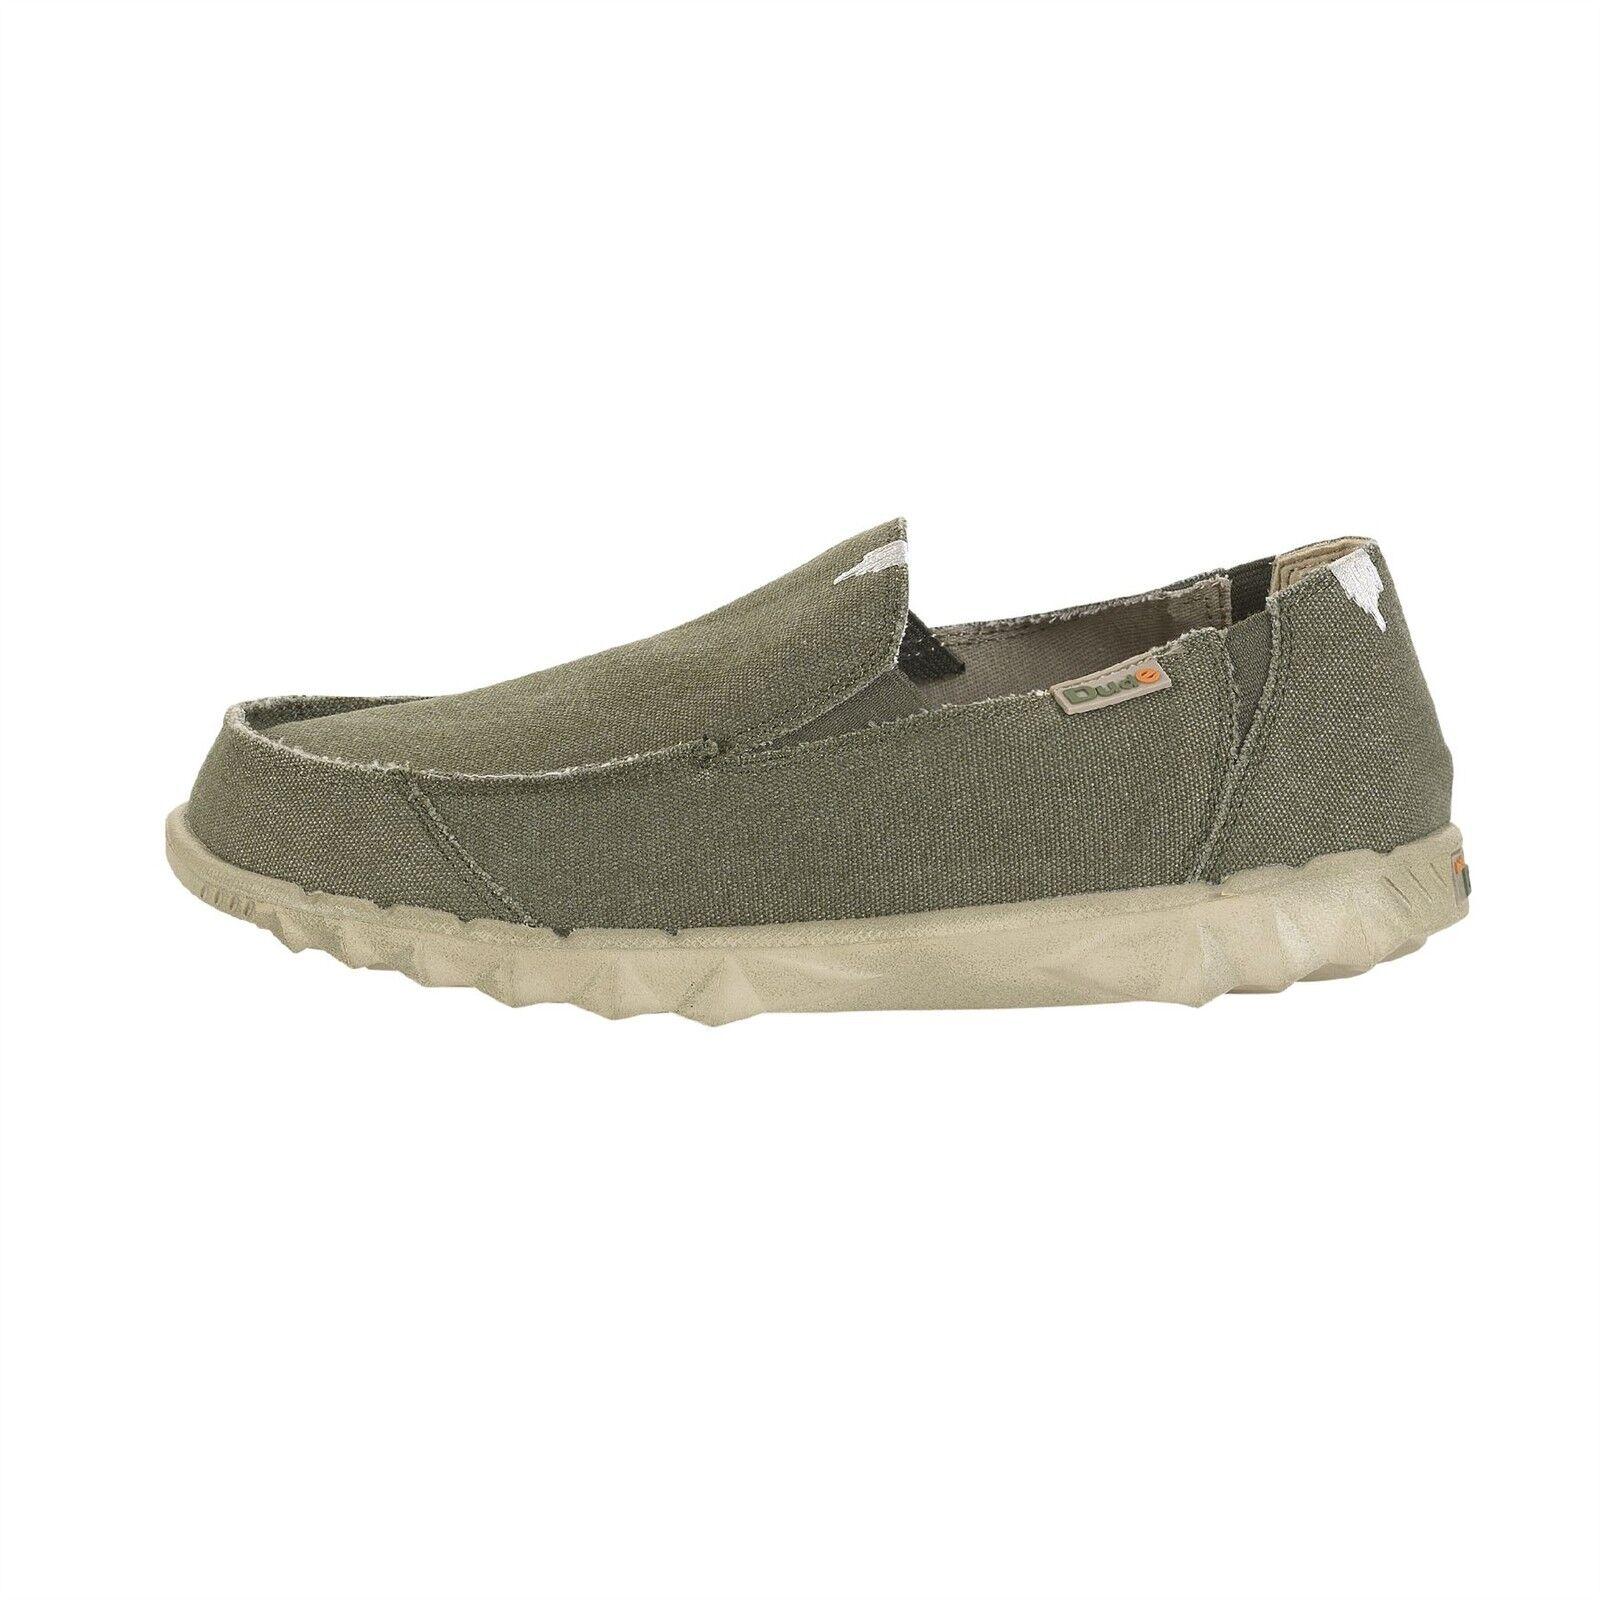 DUDE scarpe Farty Classic Mesh Musk  Slip Sulle scarpe   Mule in UK6 a UK15  costo effettivo